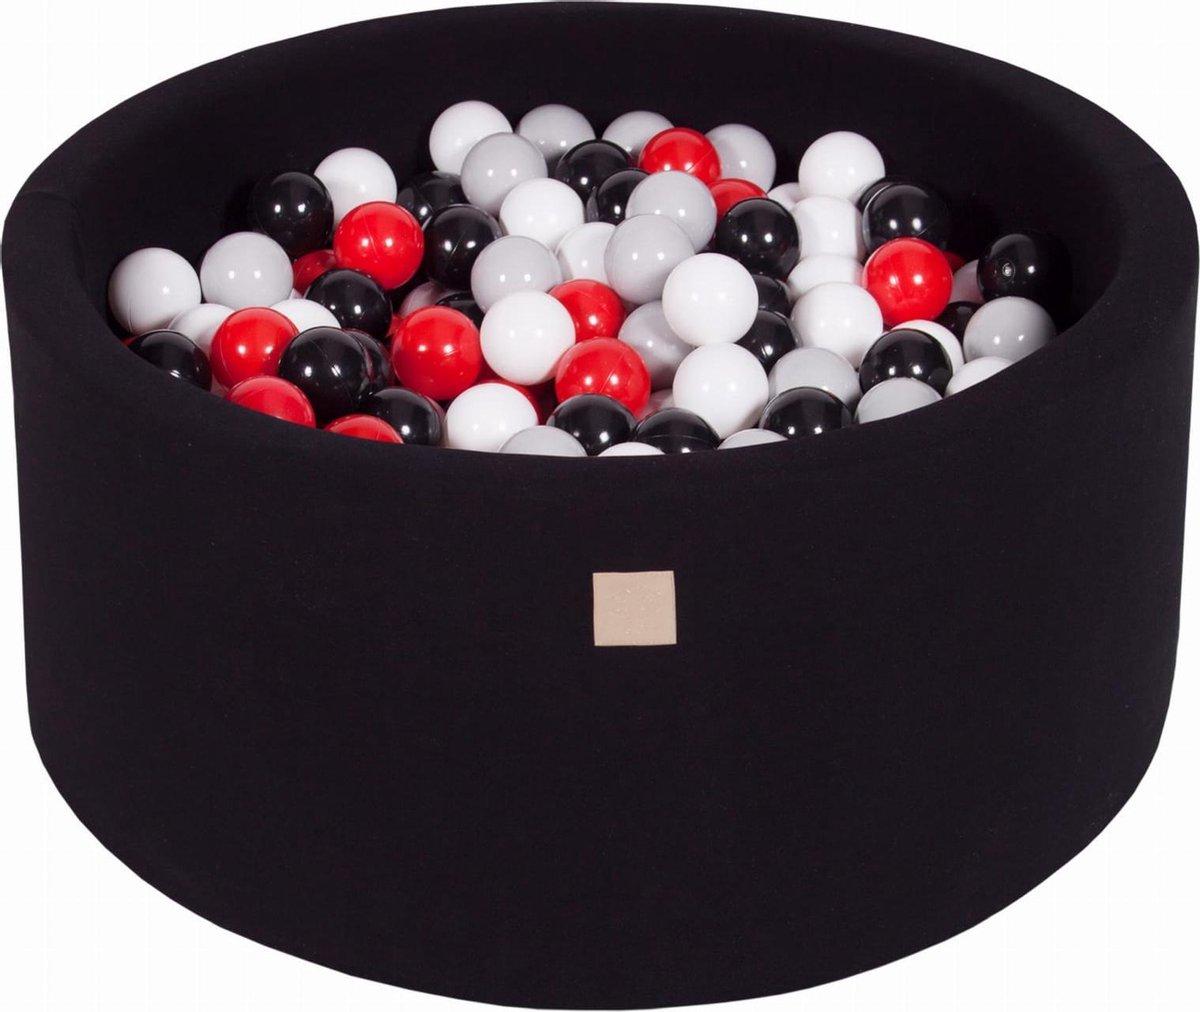 Ronde Ballenbak set incl 300 ballen 90x40cm - Zwart: Zwart, Grijs, Rood, Wit